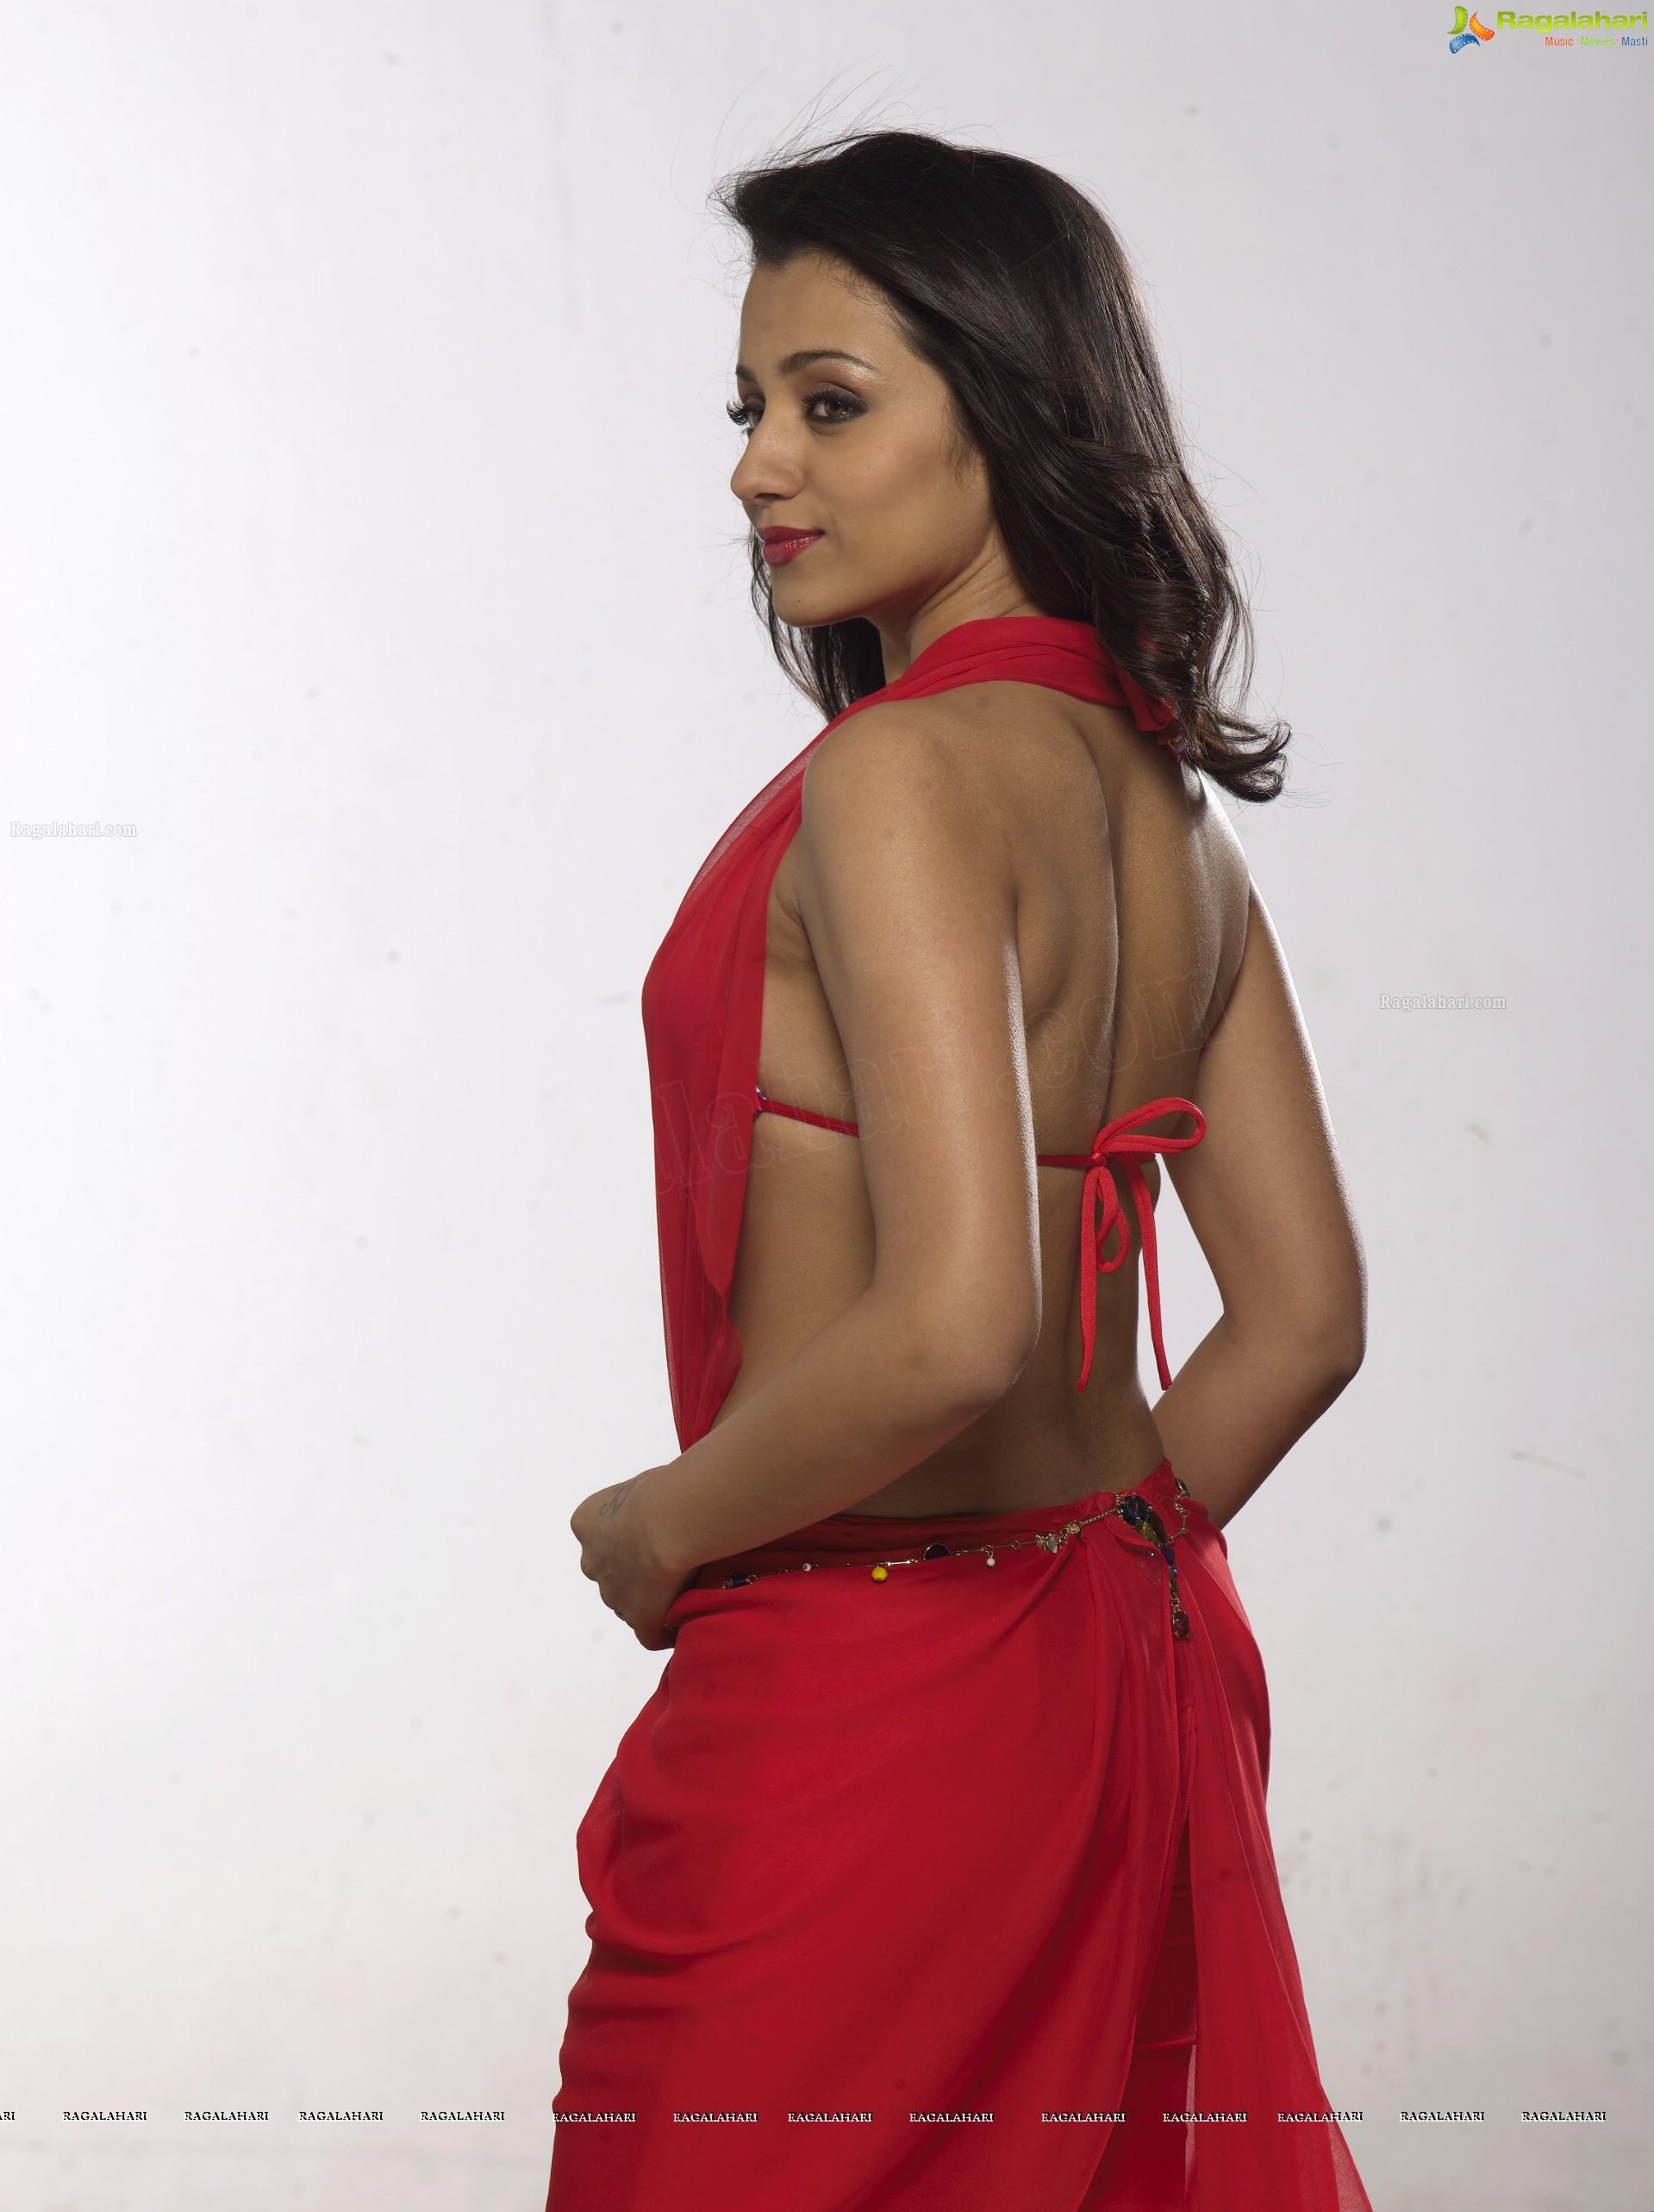 Don T Miss Trisha Red Hot High Definition Stills